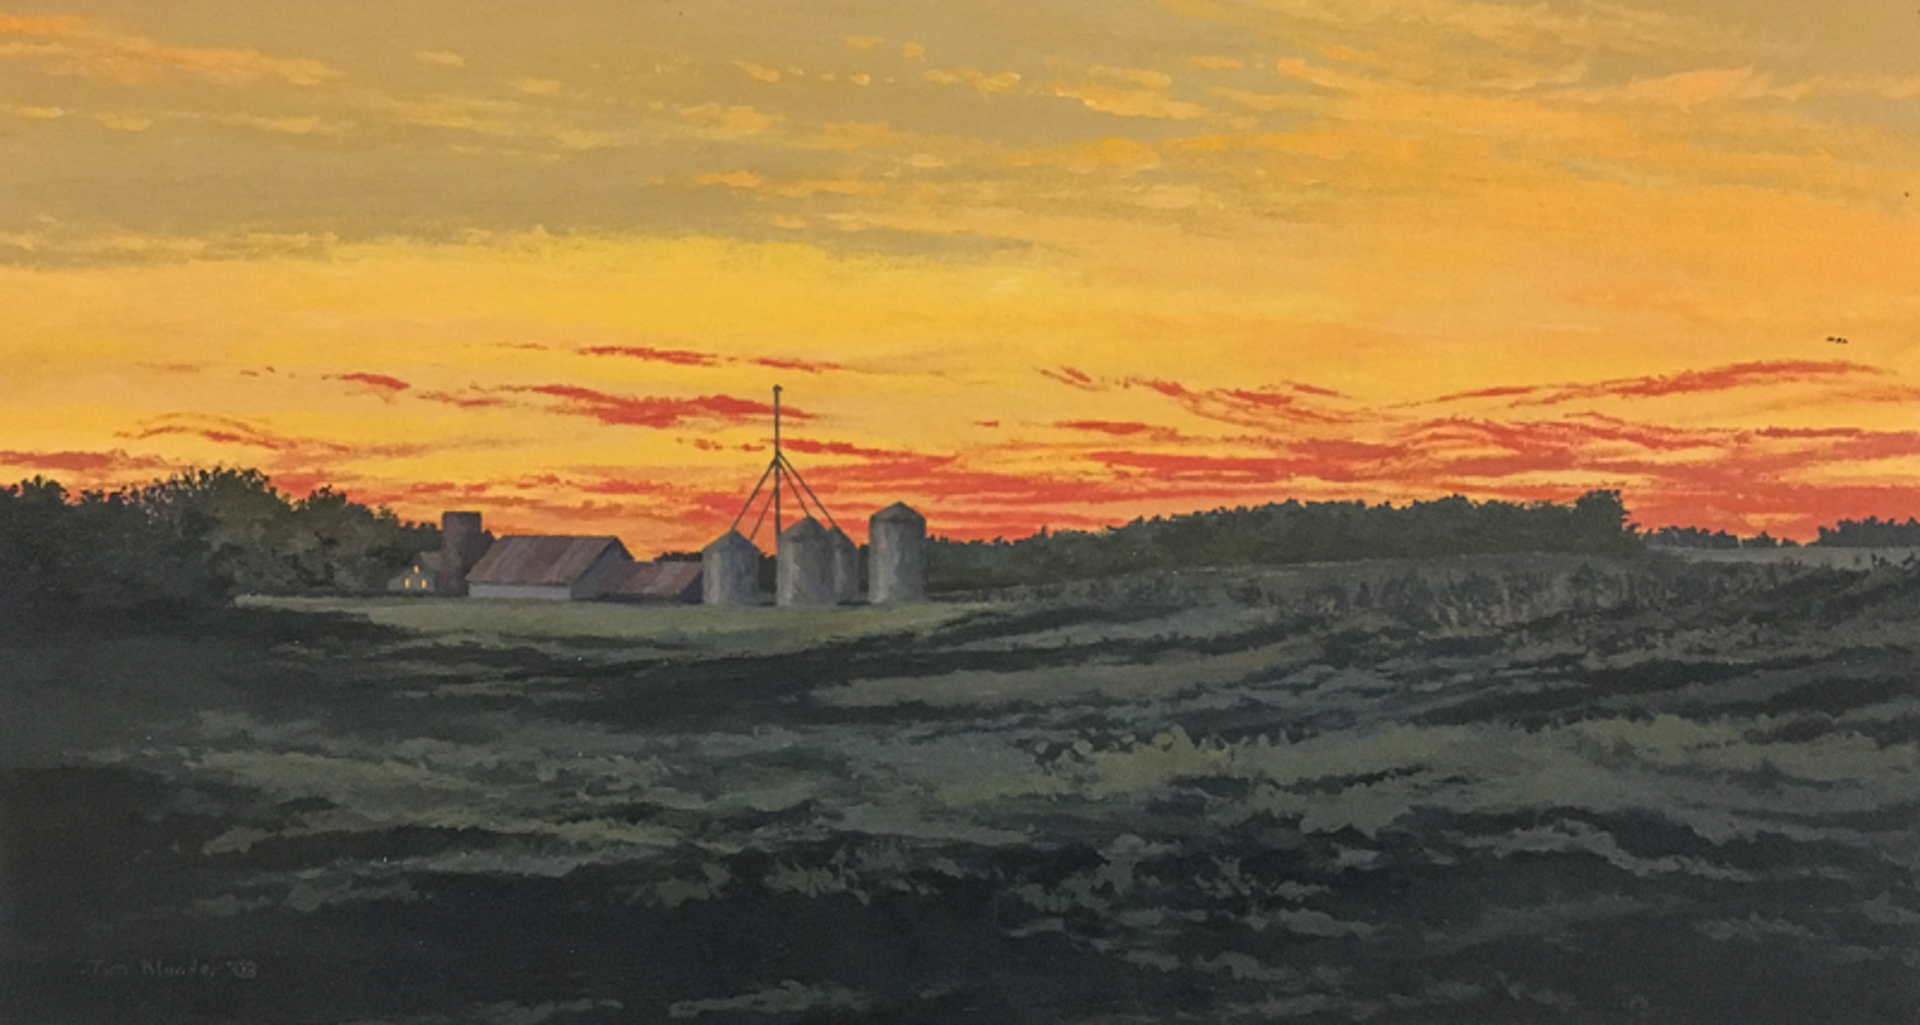 Red Sunset #2 by Tim Klunder